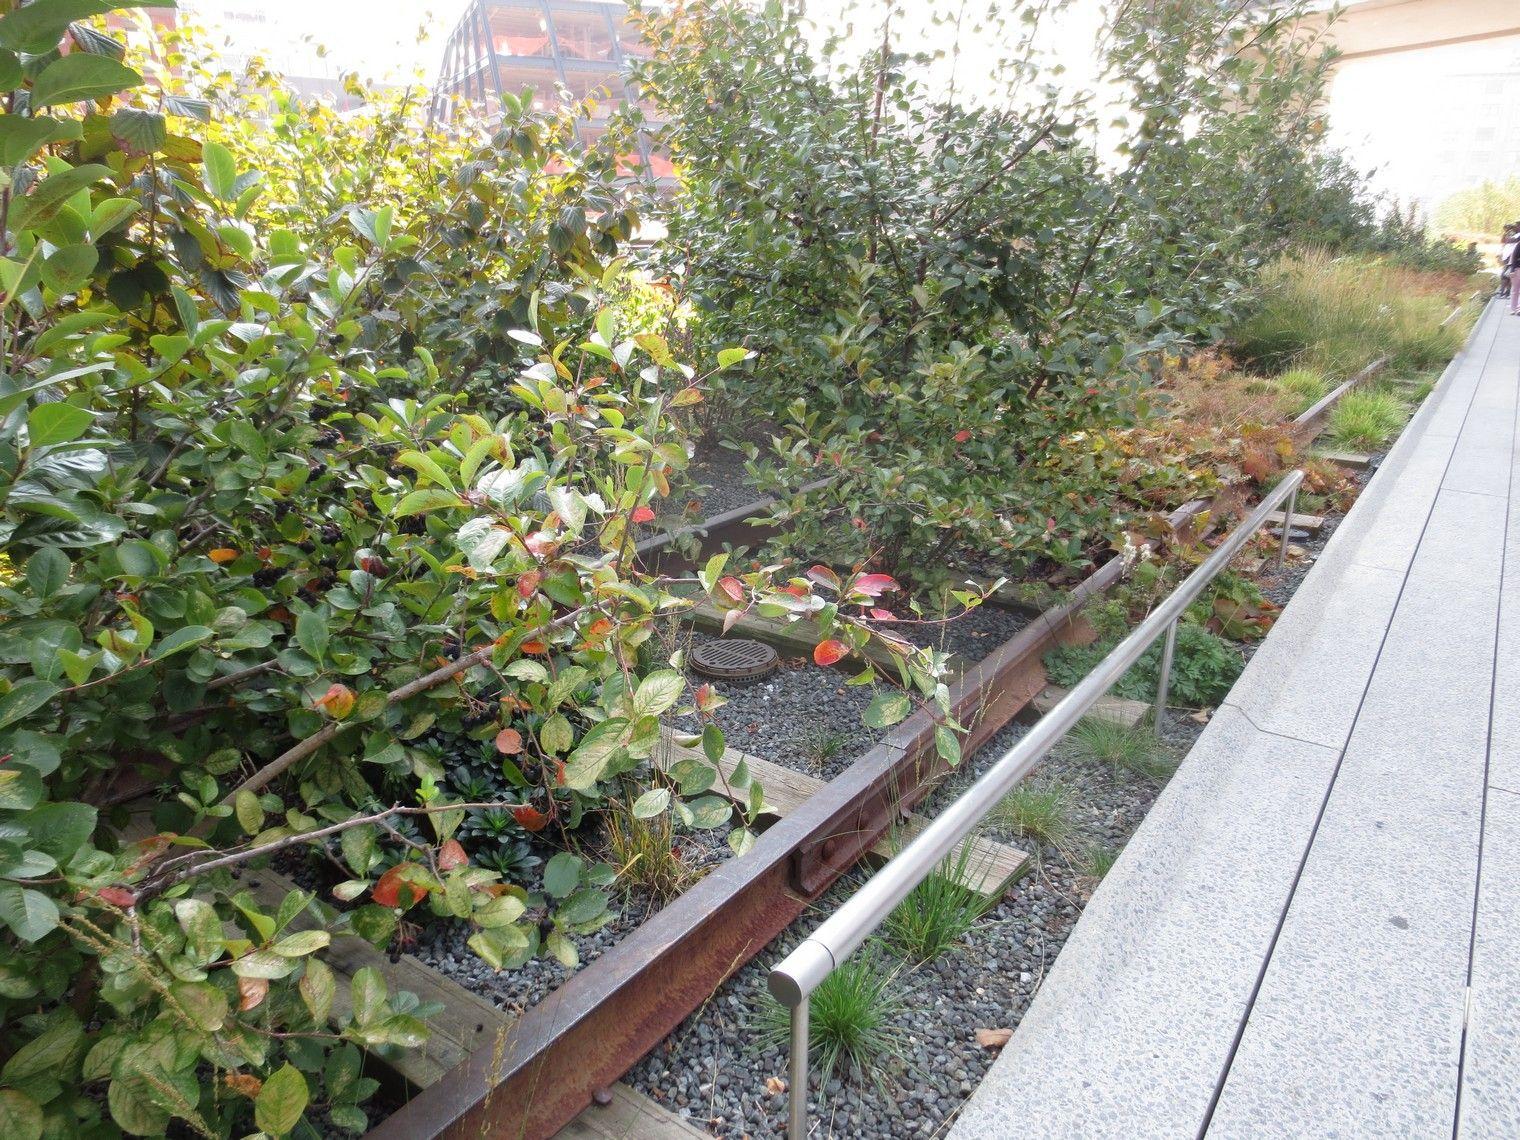 #garden on a #railway #usa